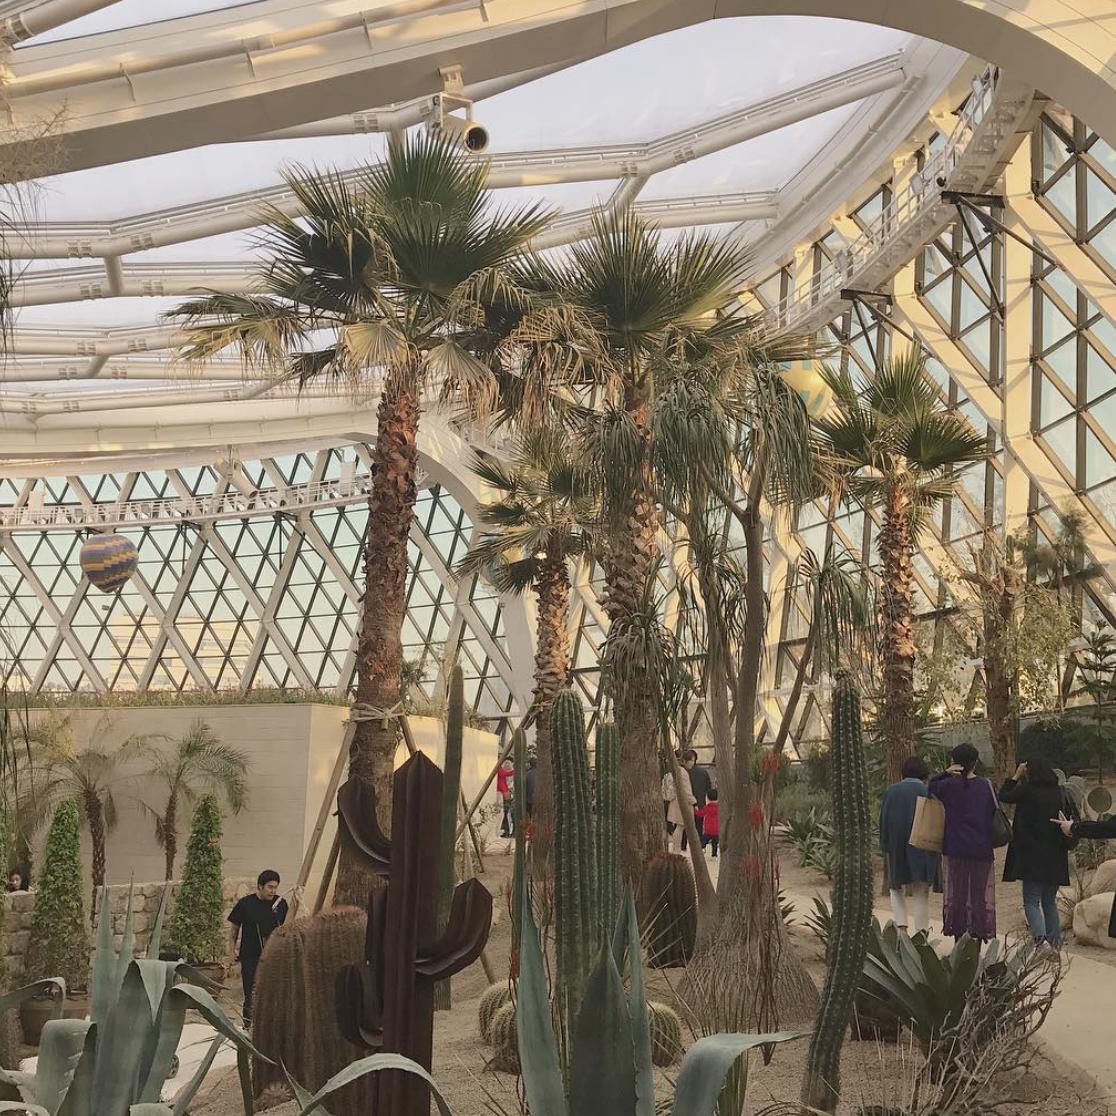 If Singapore has Gardens by the Bay, South Korea has Seoul Botanic ...